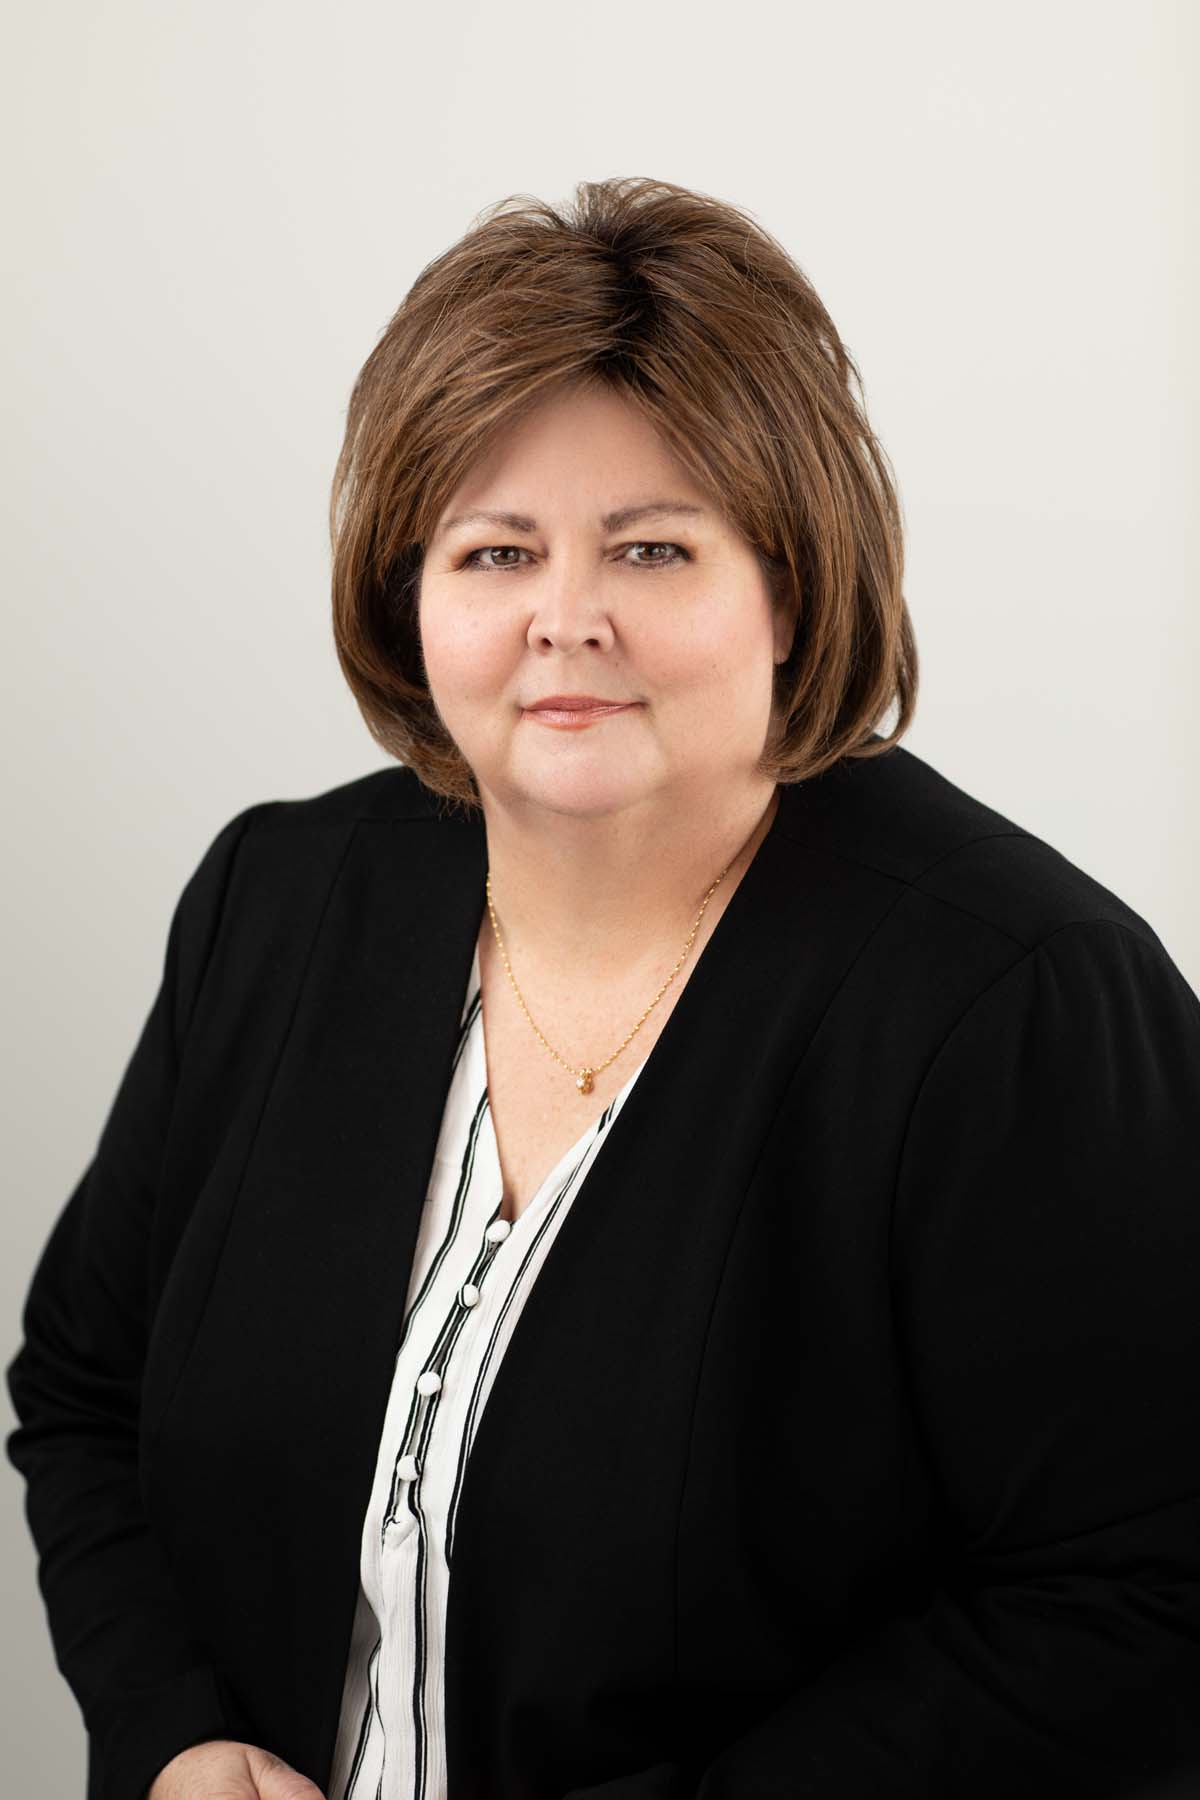 Cheryl Alkire